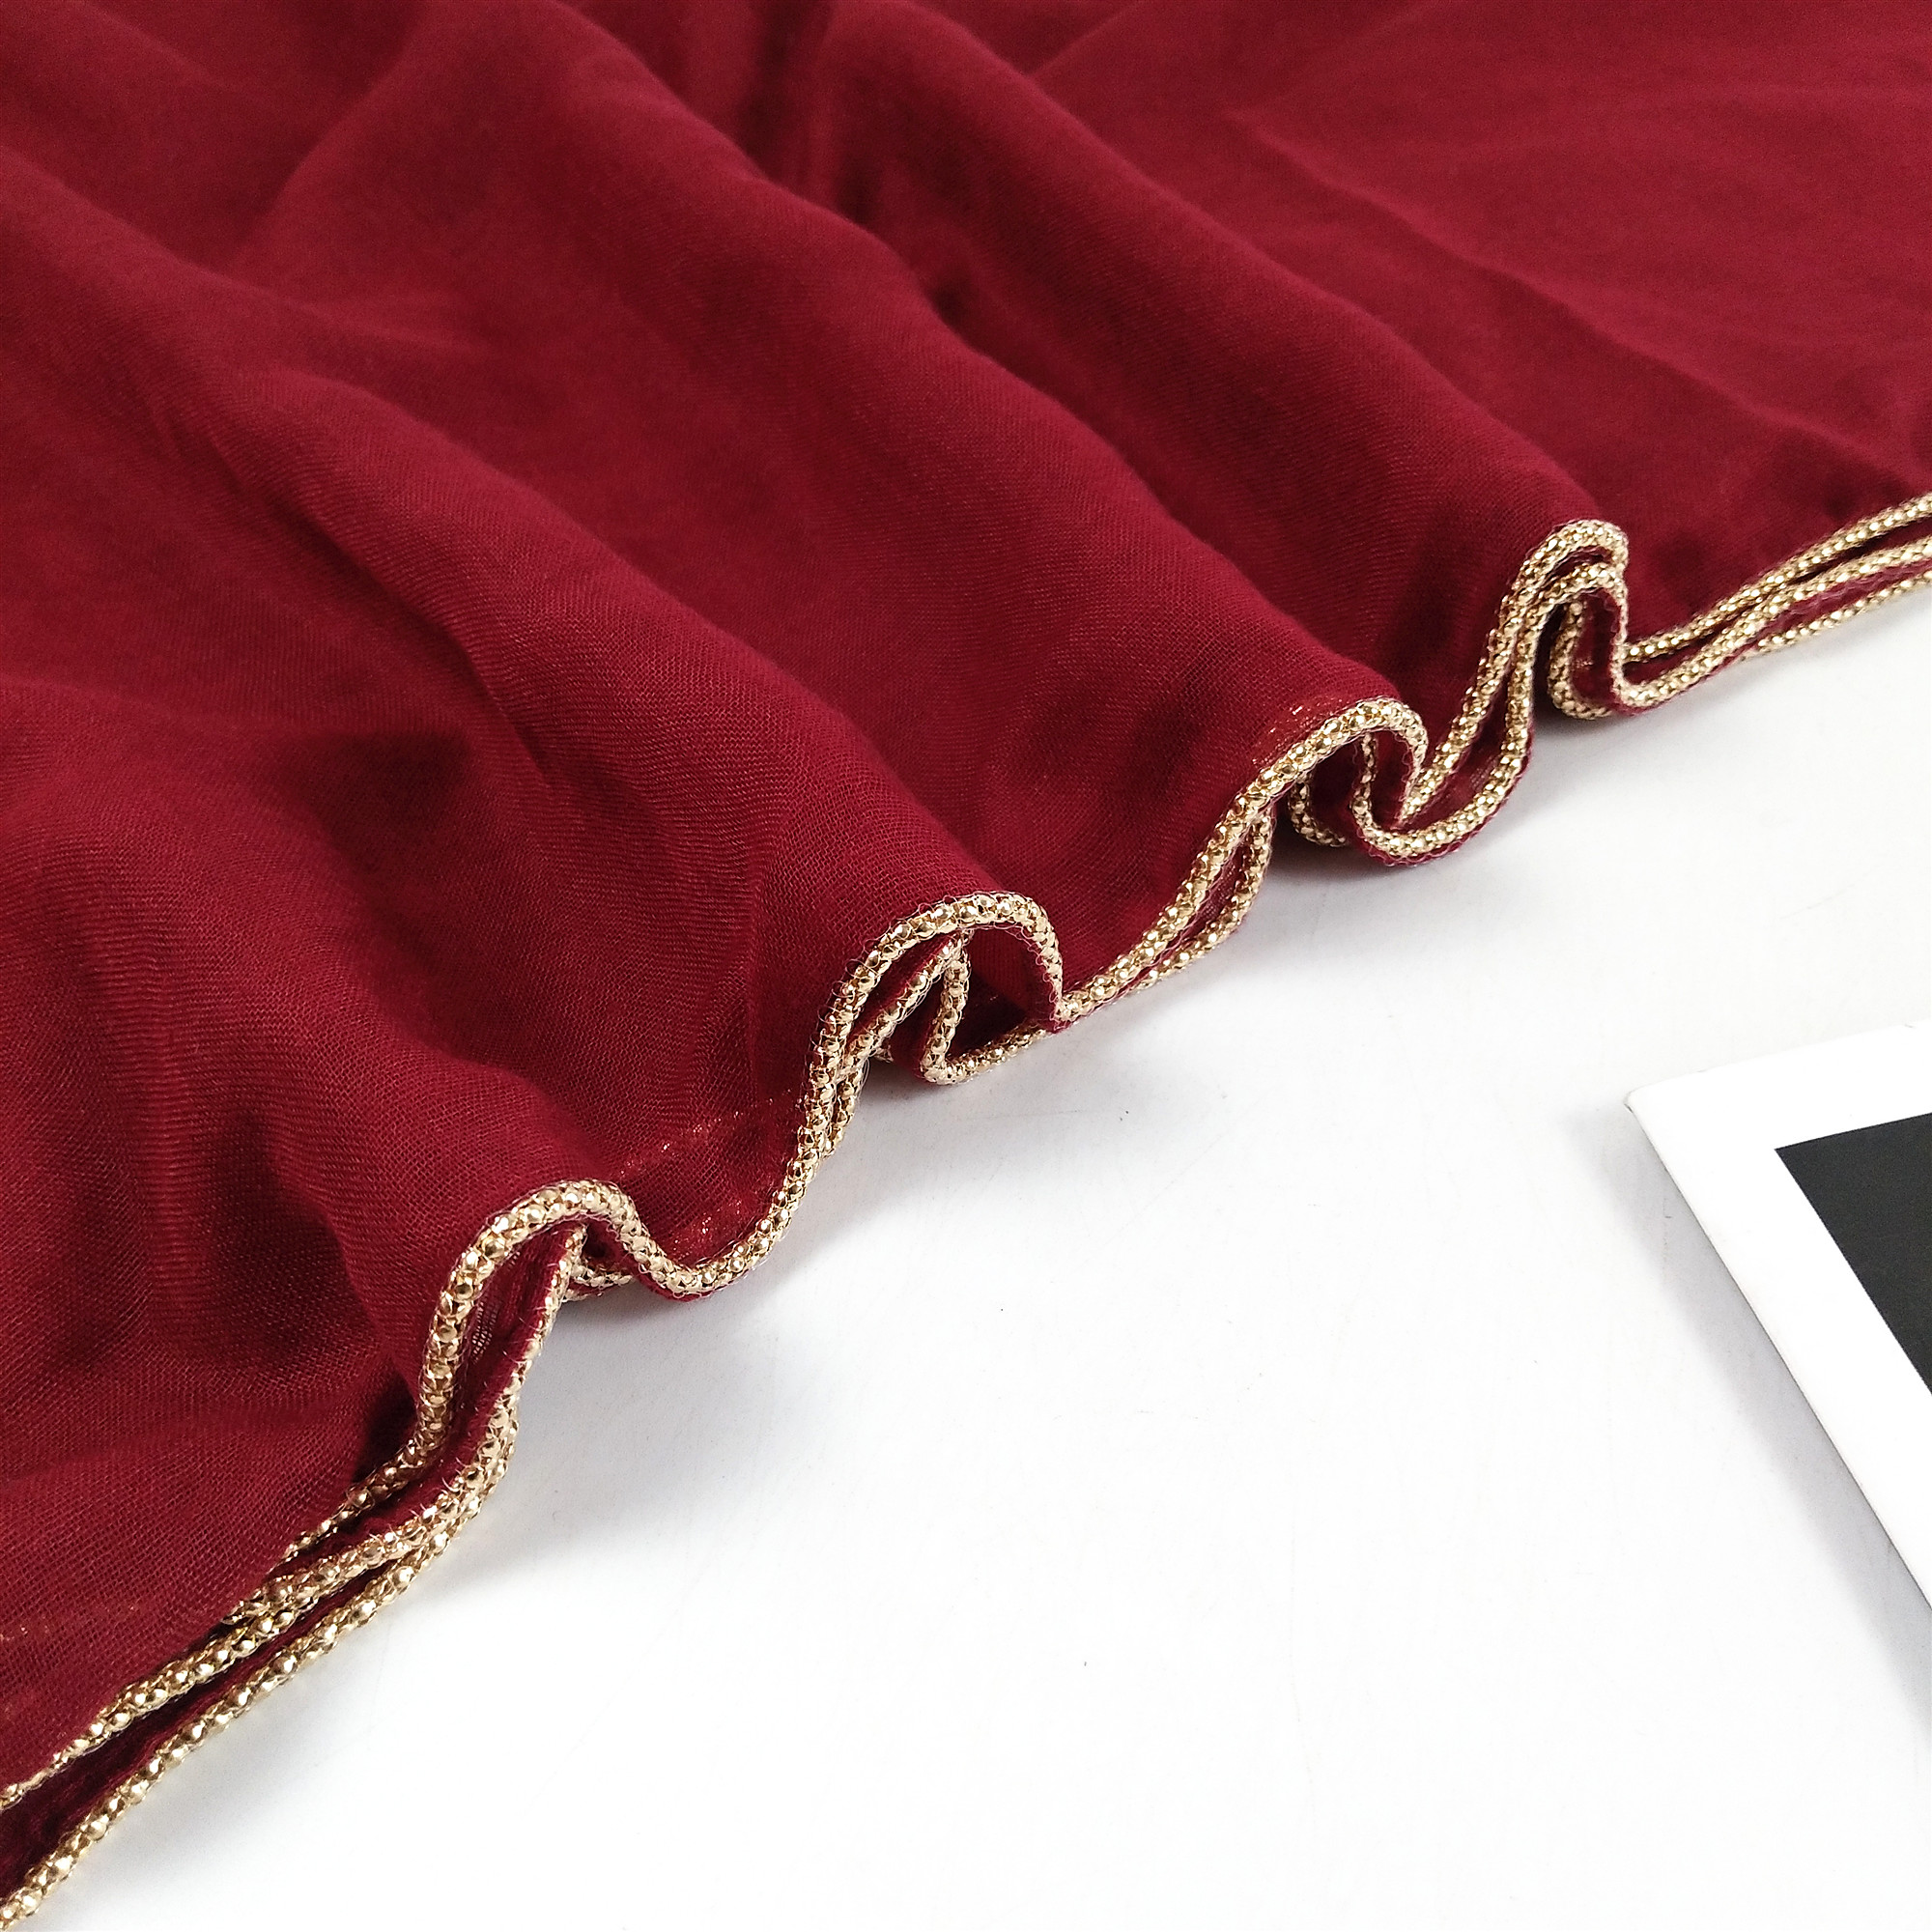 N9 Hot sale Solid hijab scarf gold beads cotton scarves chain plain wraps shawls maxi fashion headband long scarves 180*80cm